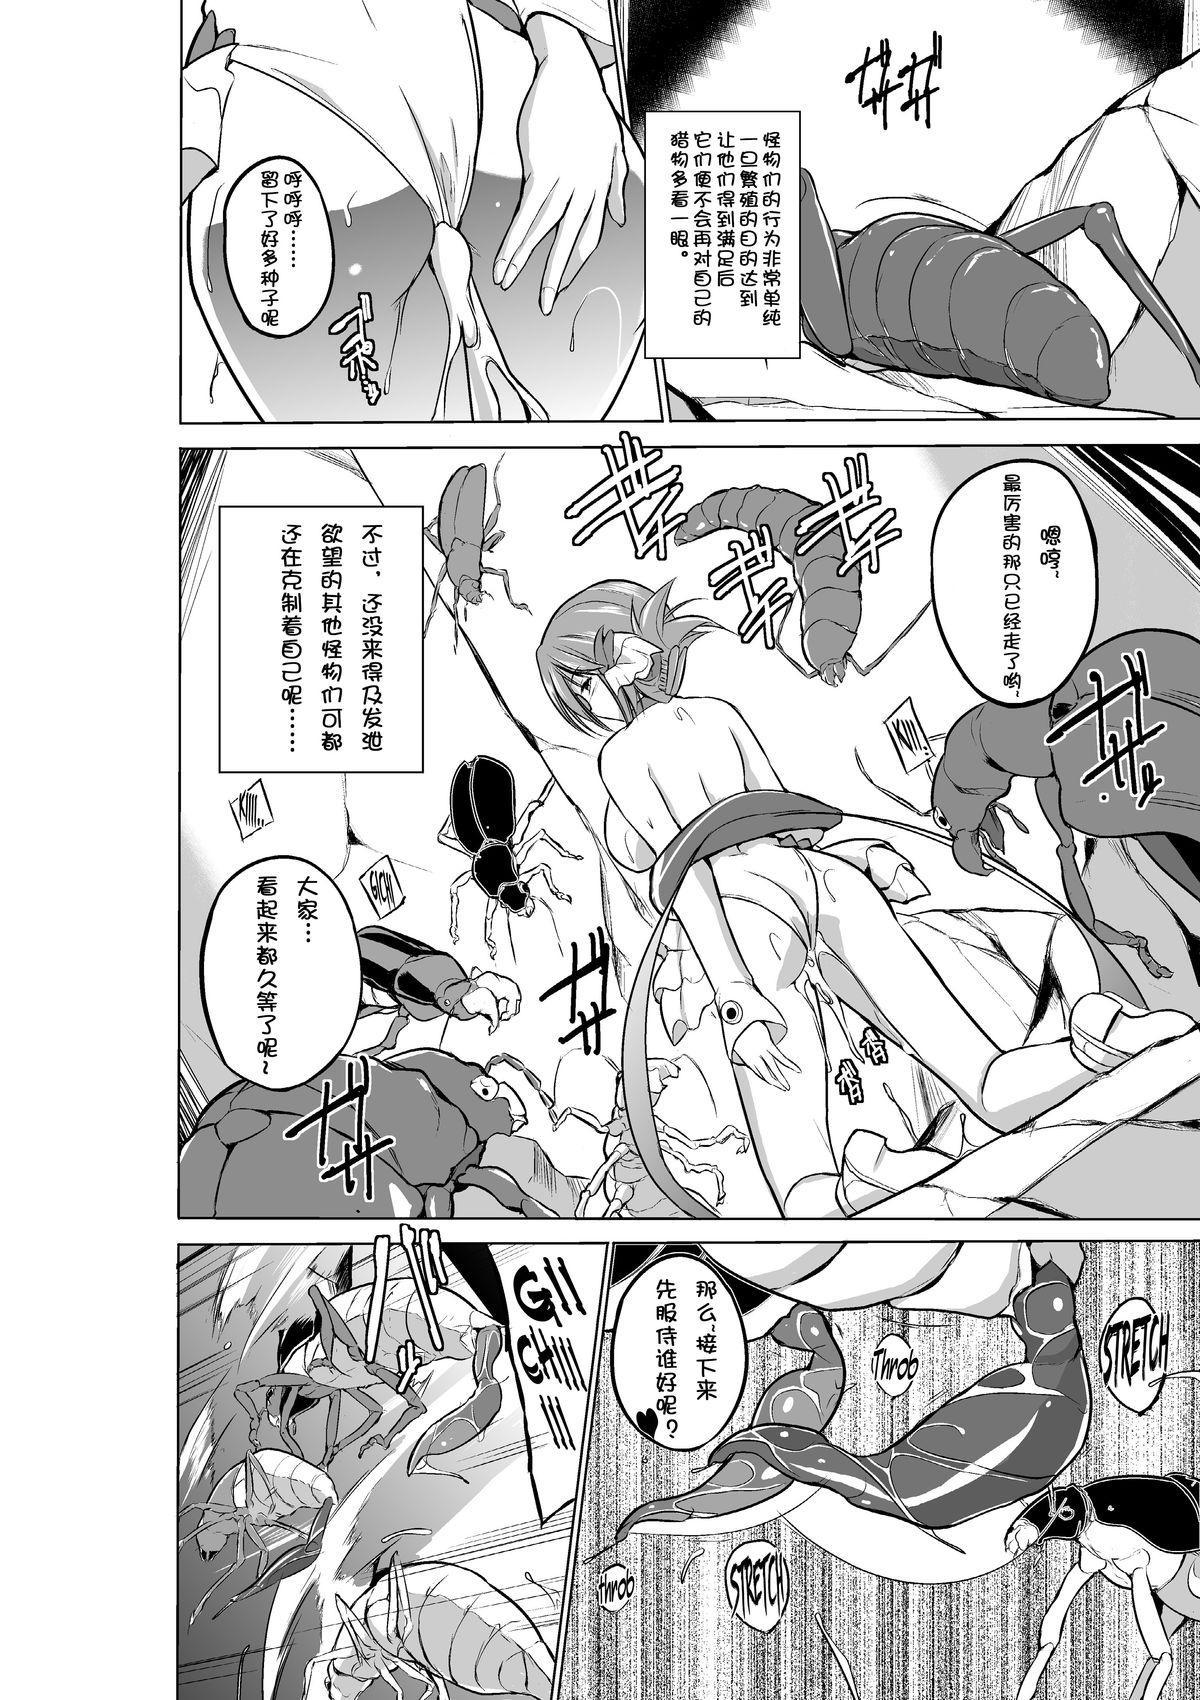 Dungeon Travelers - Manaka no Himegoto 2 9